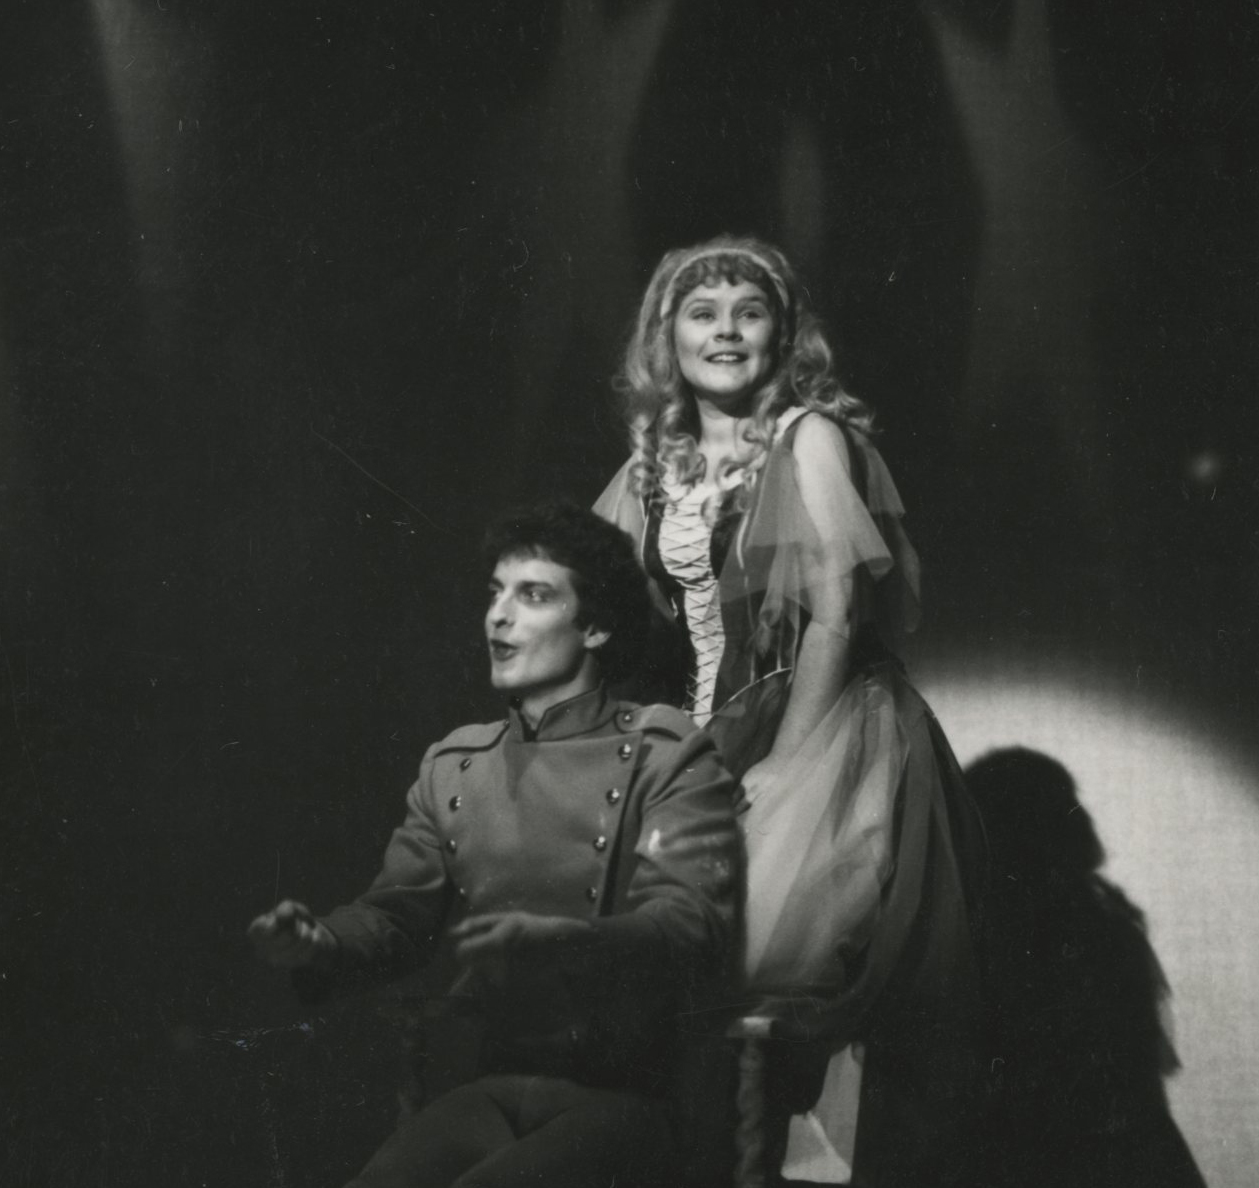 EUL MS 348 - Imelda Staunton as Cinderella, possibly with buttons (1978) ©Nicholas Toyne